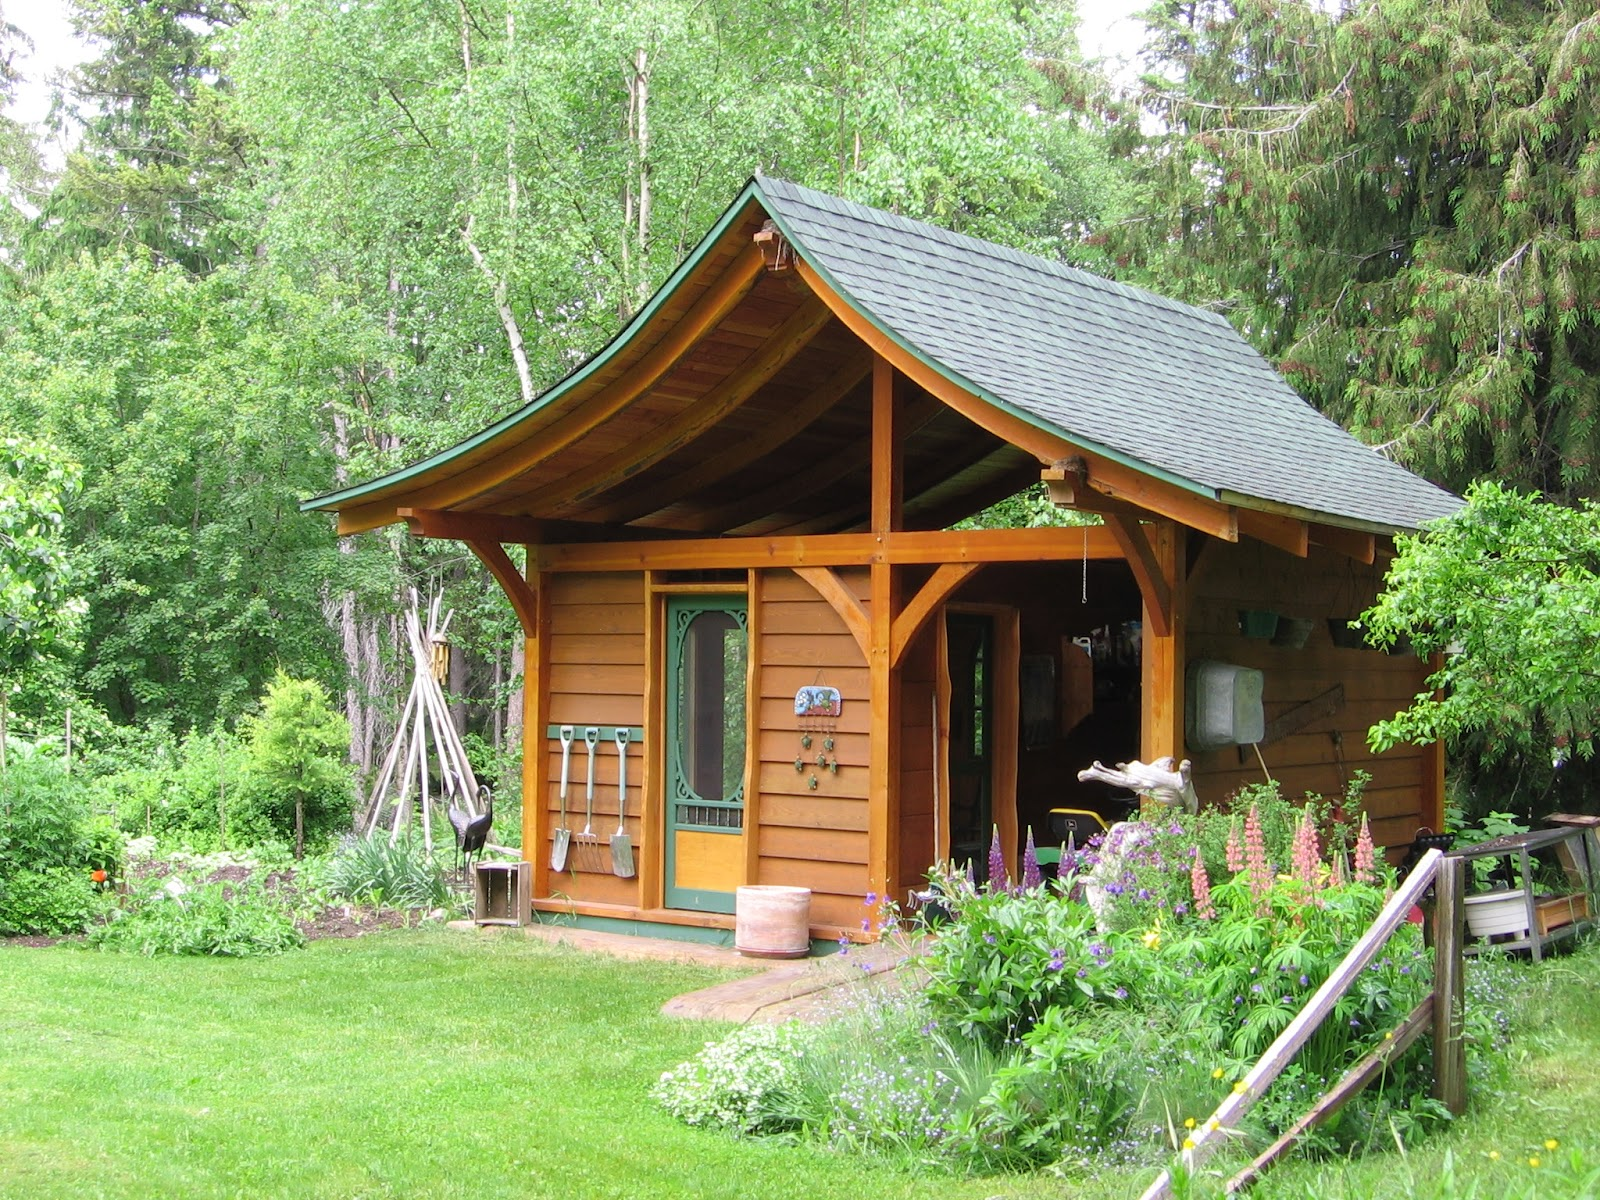 Royal storage sheds usa wood garden sheds canada plastic for Garden sheds canada